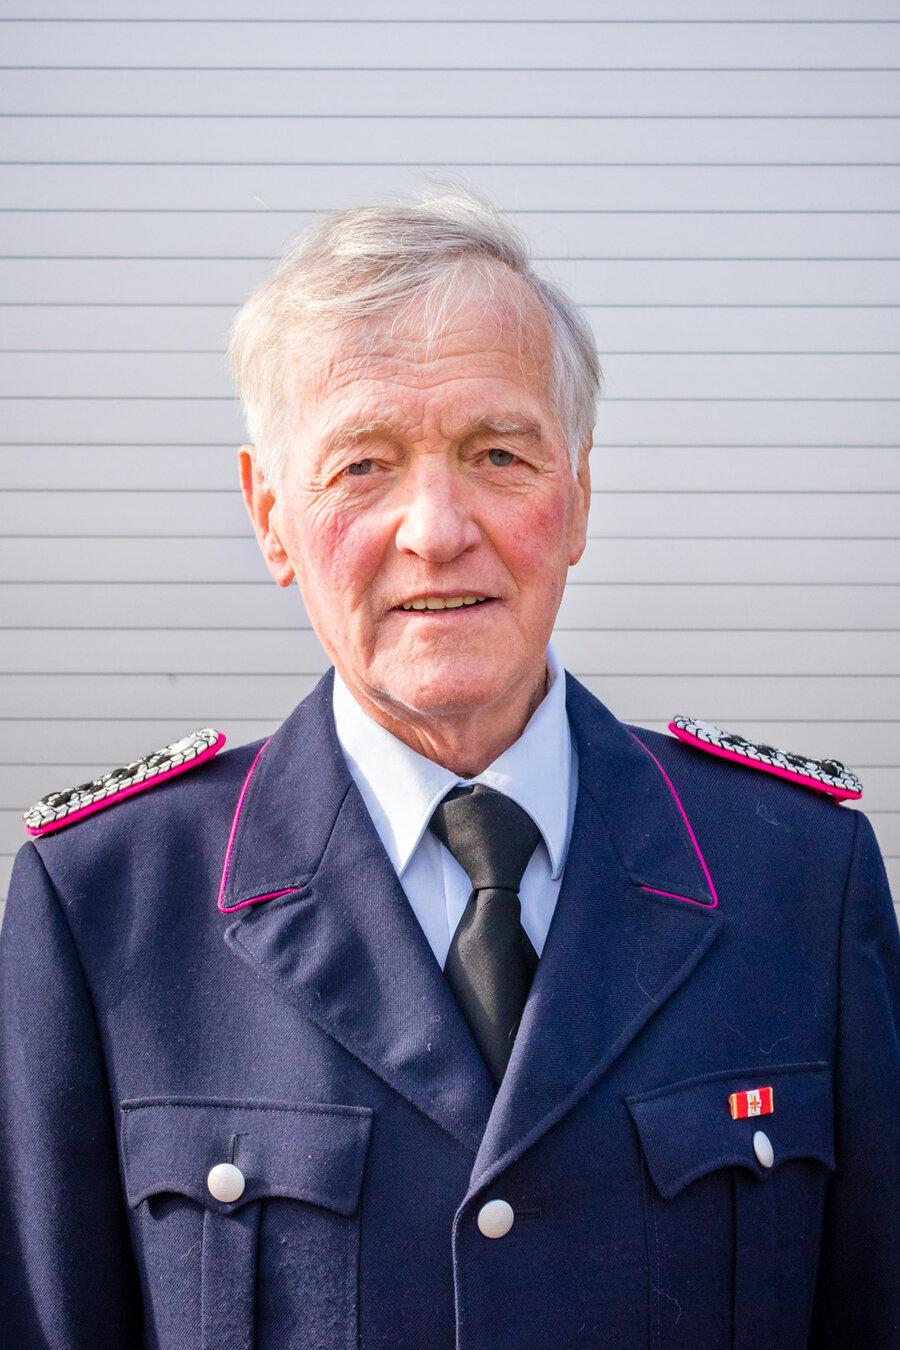 Hans_Martens